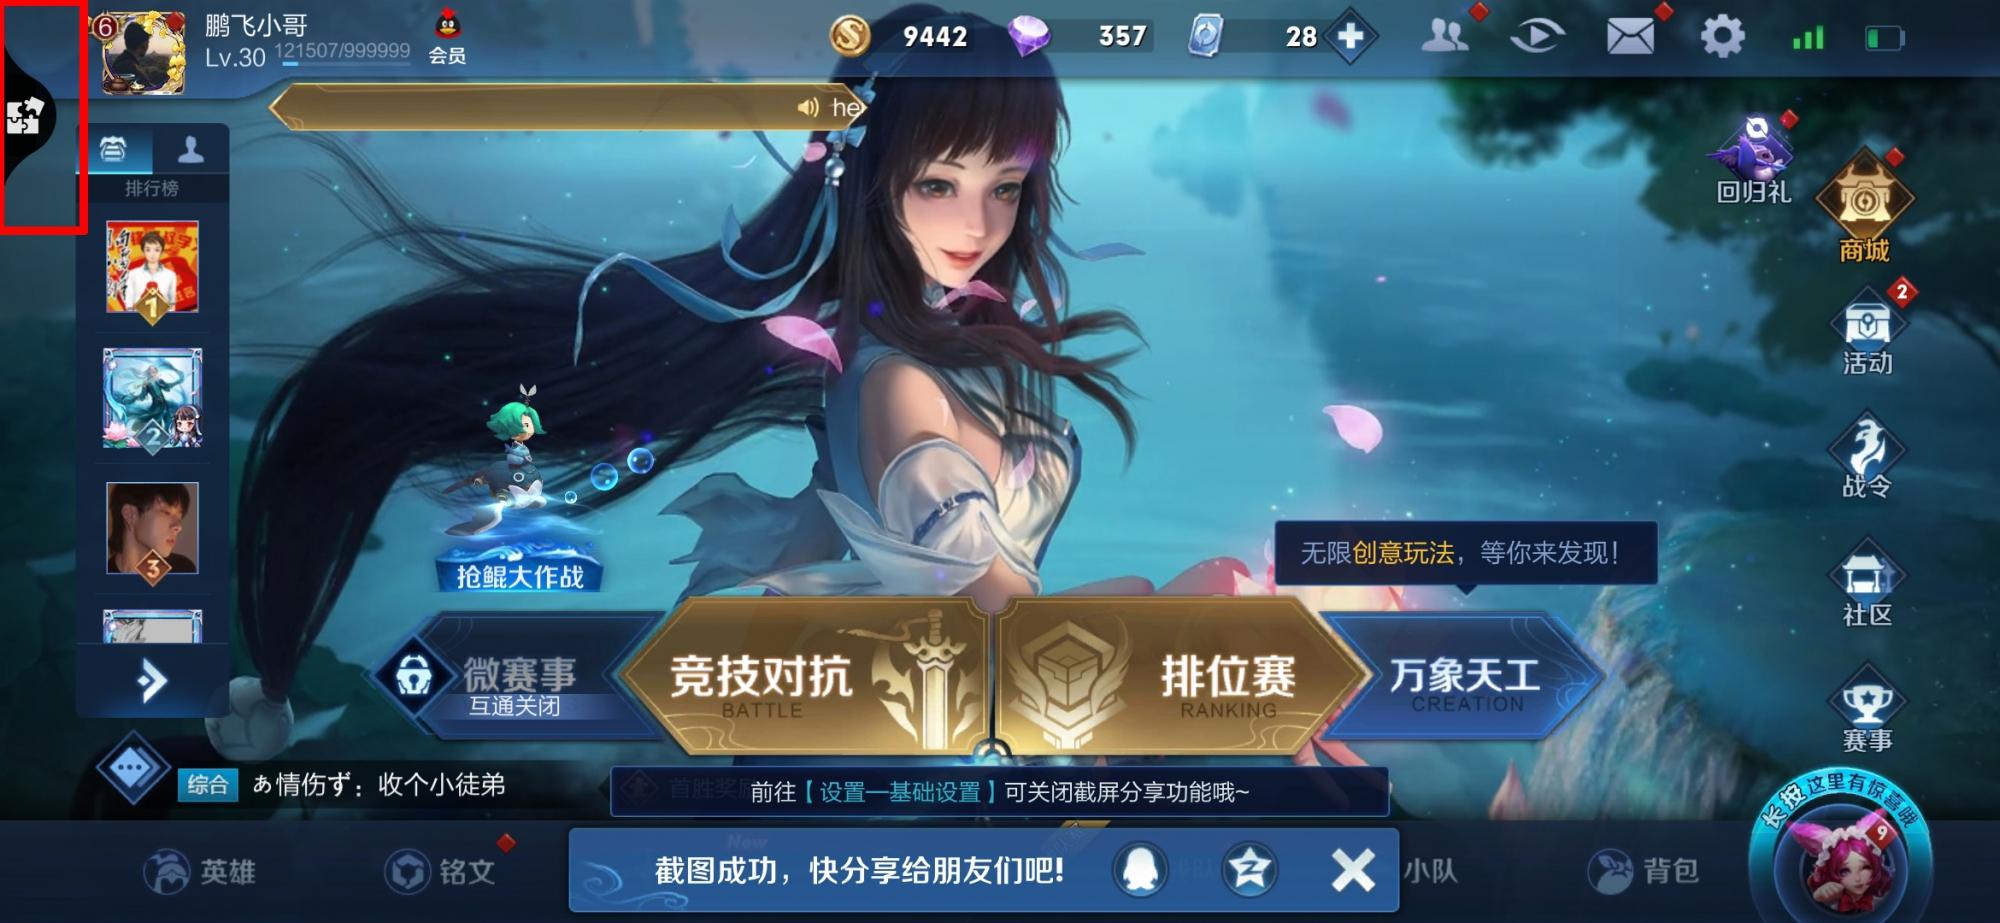 Screenshot_20191012_144030_com.tencent.tmgp.sgame.jpg